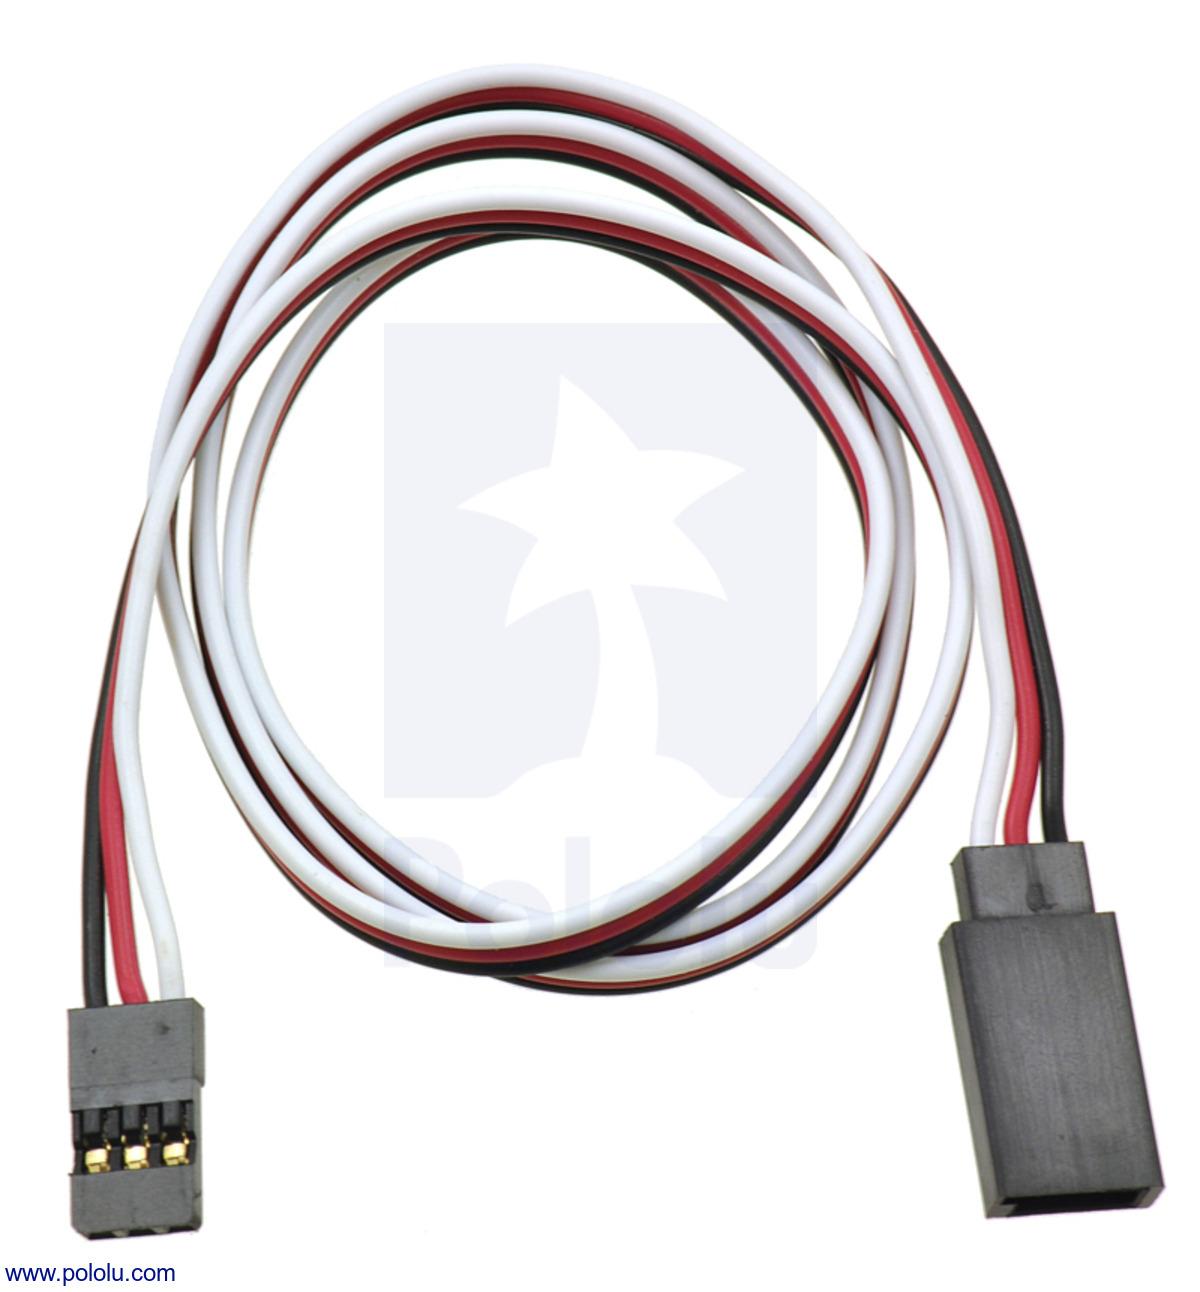 Pololu Servo Extension Cable 24 Male Female Wiring Plug Australia